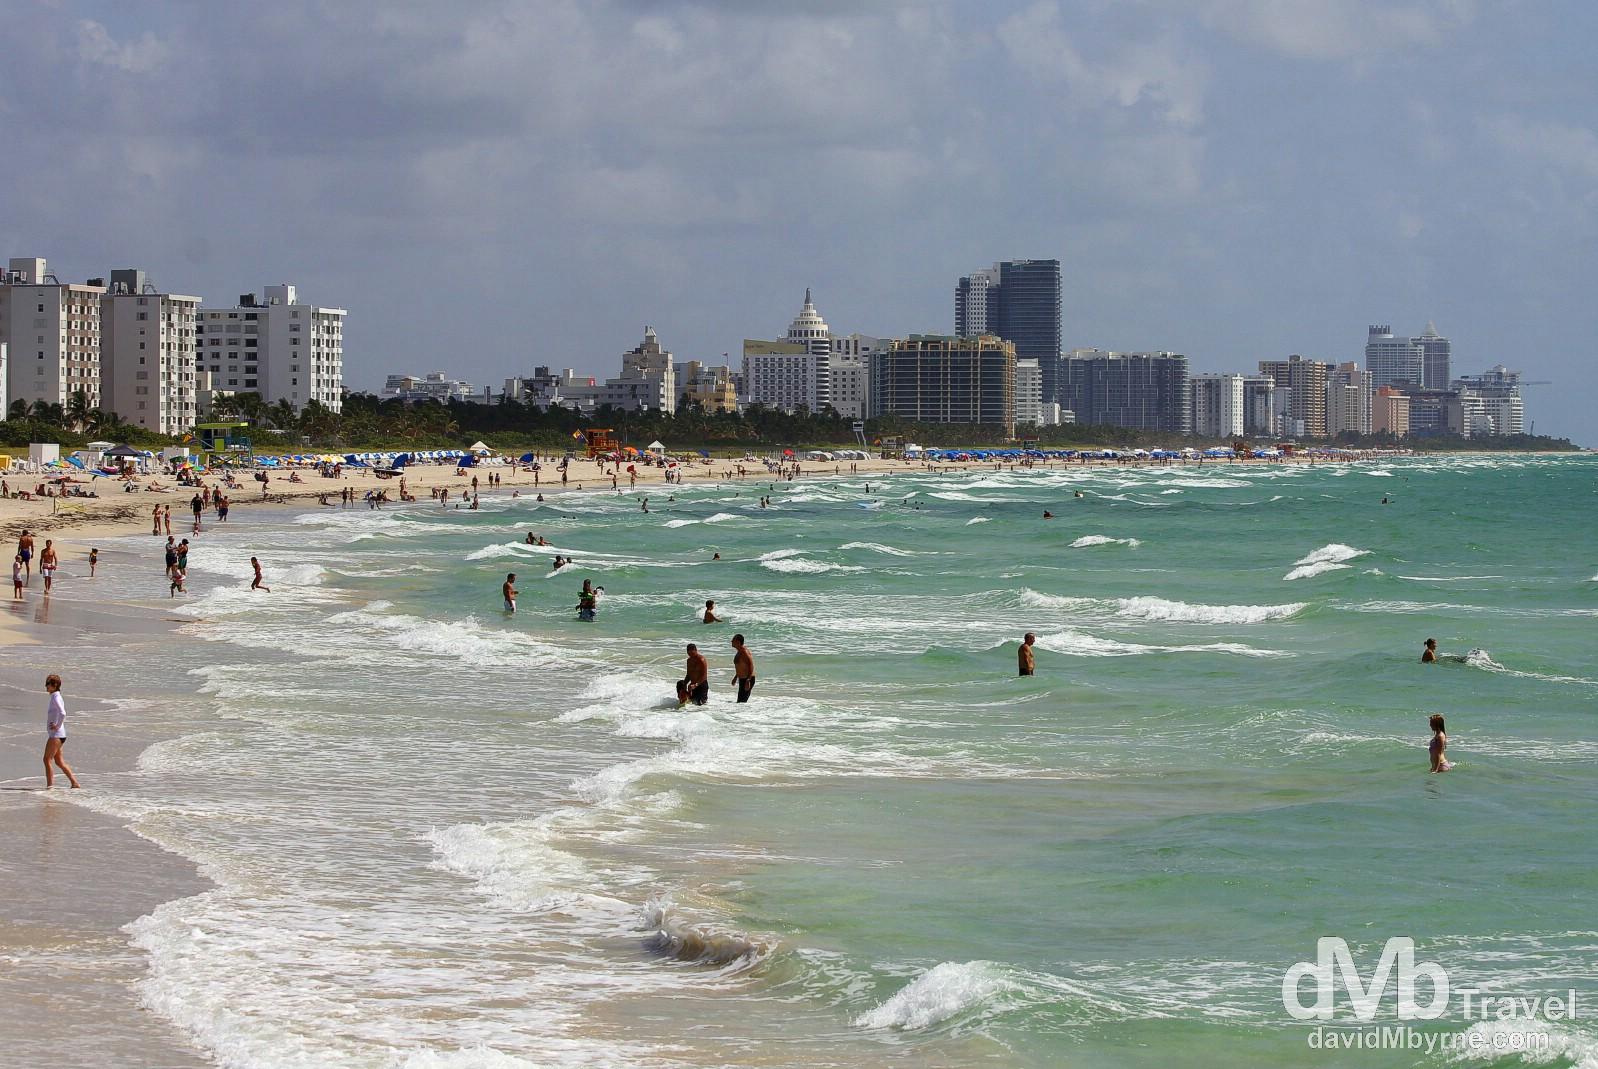 South Beach, Miami, Florida, USA. July 8th 2013.